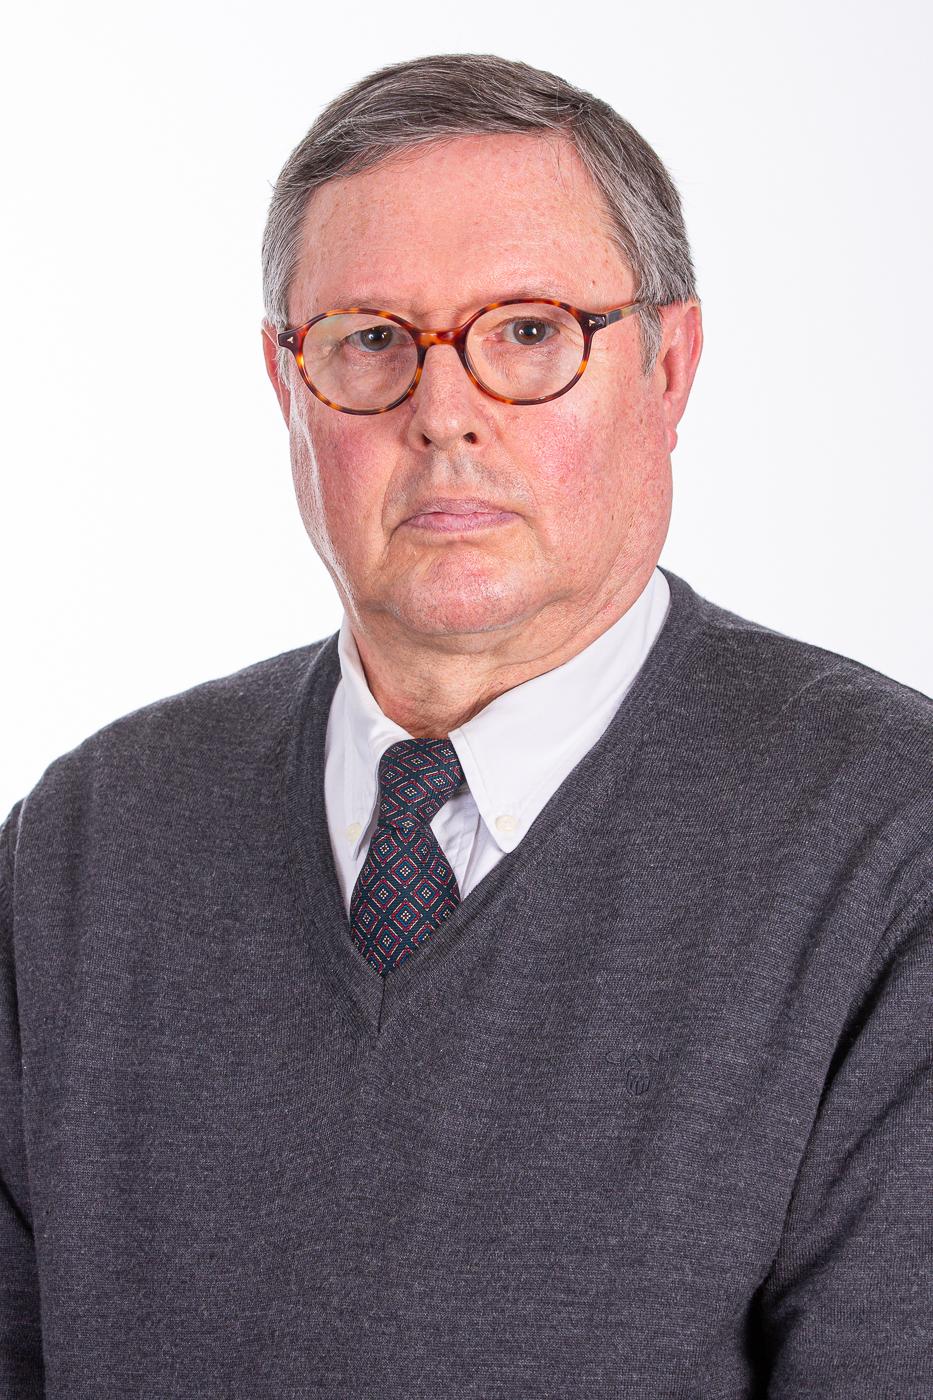 Advokat Claus-Frimann-Dahl